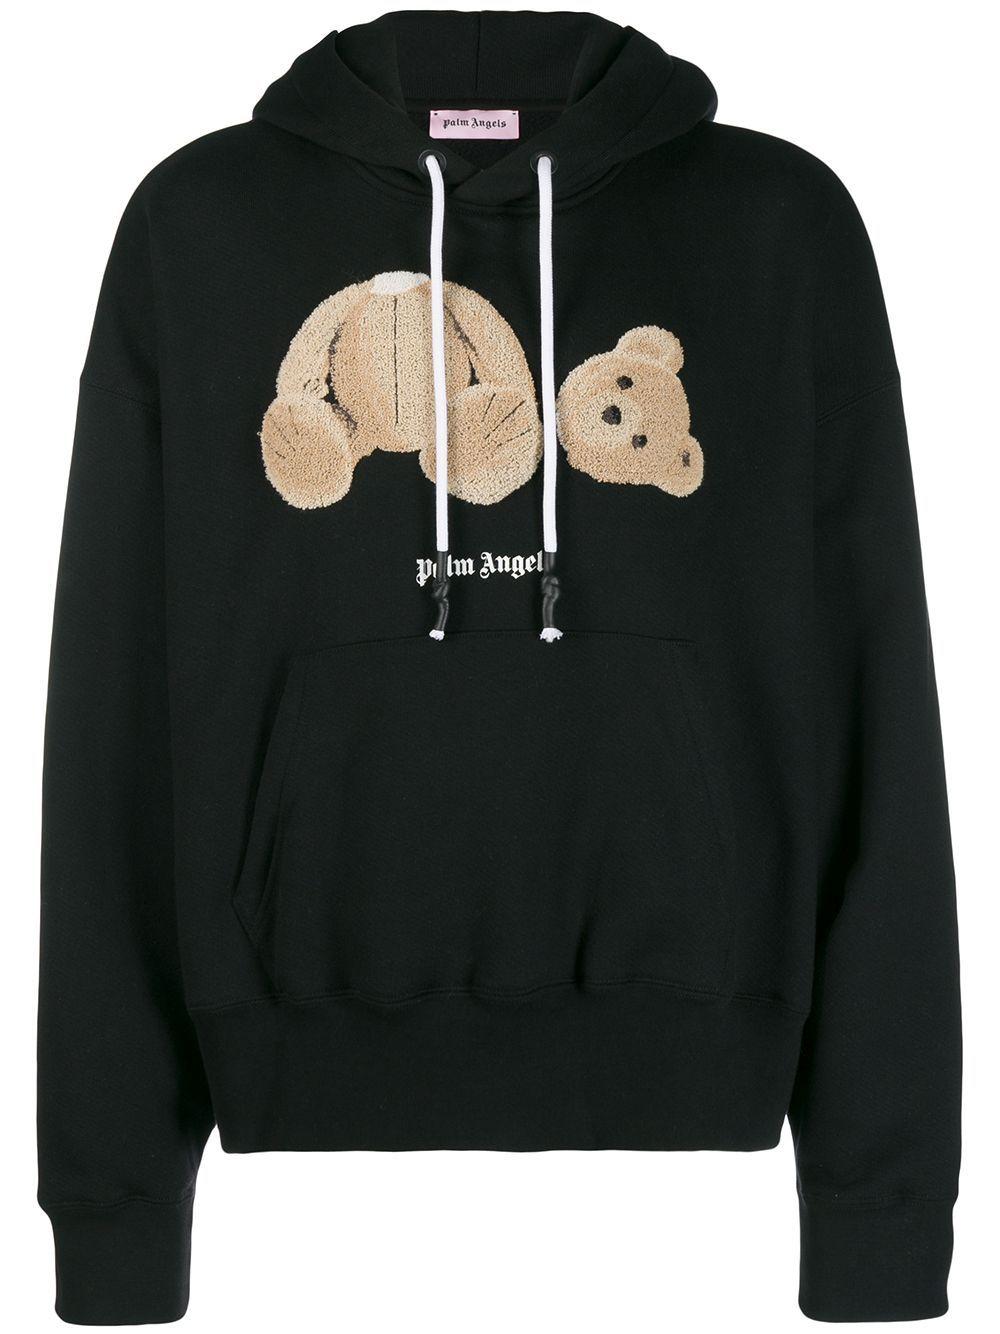 Palm Angels Teddy Bear Hooded Sweatshirt Black Hooded Sweatshirts Angel Teddy Black Sweatshirts [ 1334 x 1000 Pixel ]